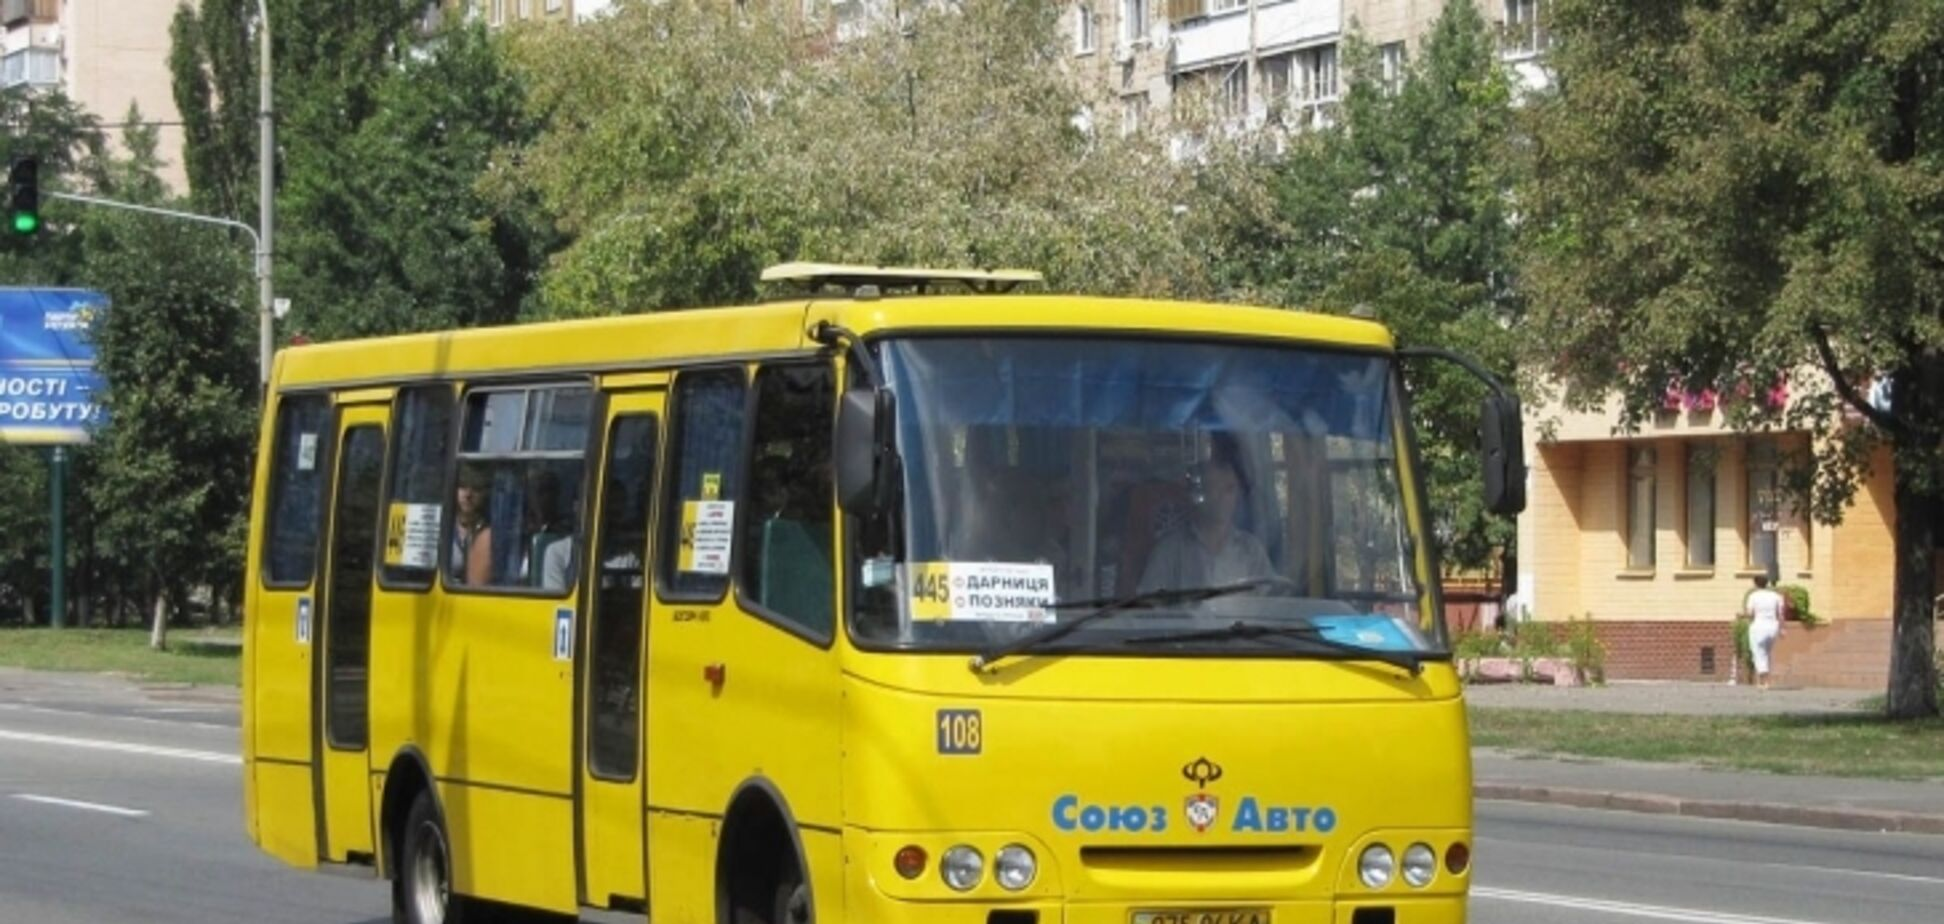 'Зачепить всю Україну'': озвучено причину масового подорожчання проїзду